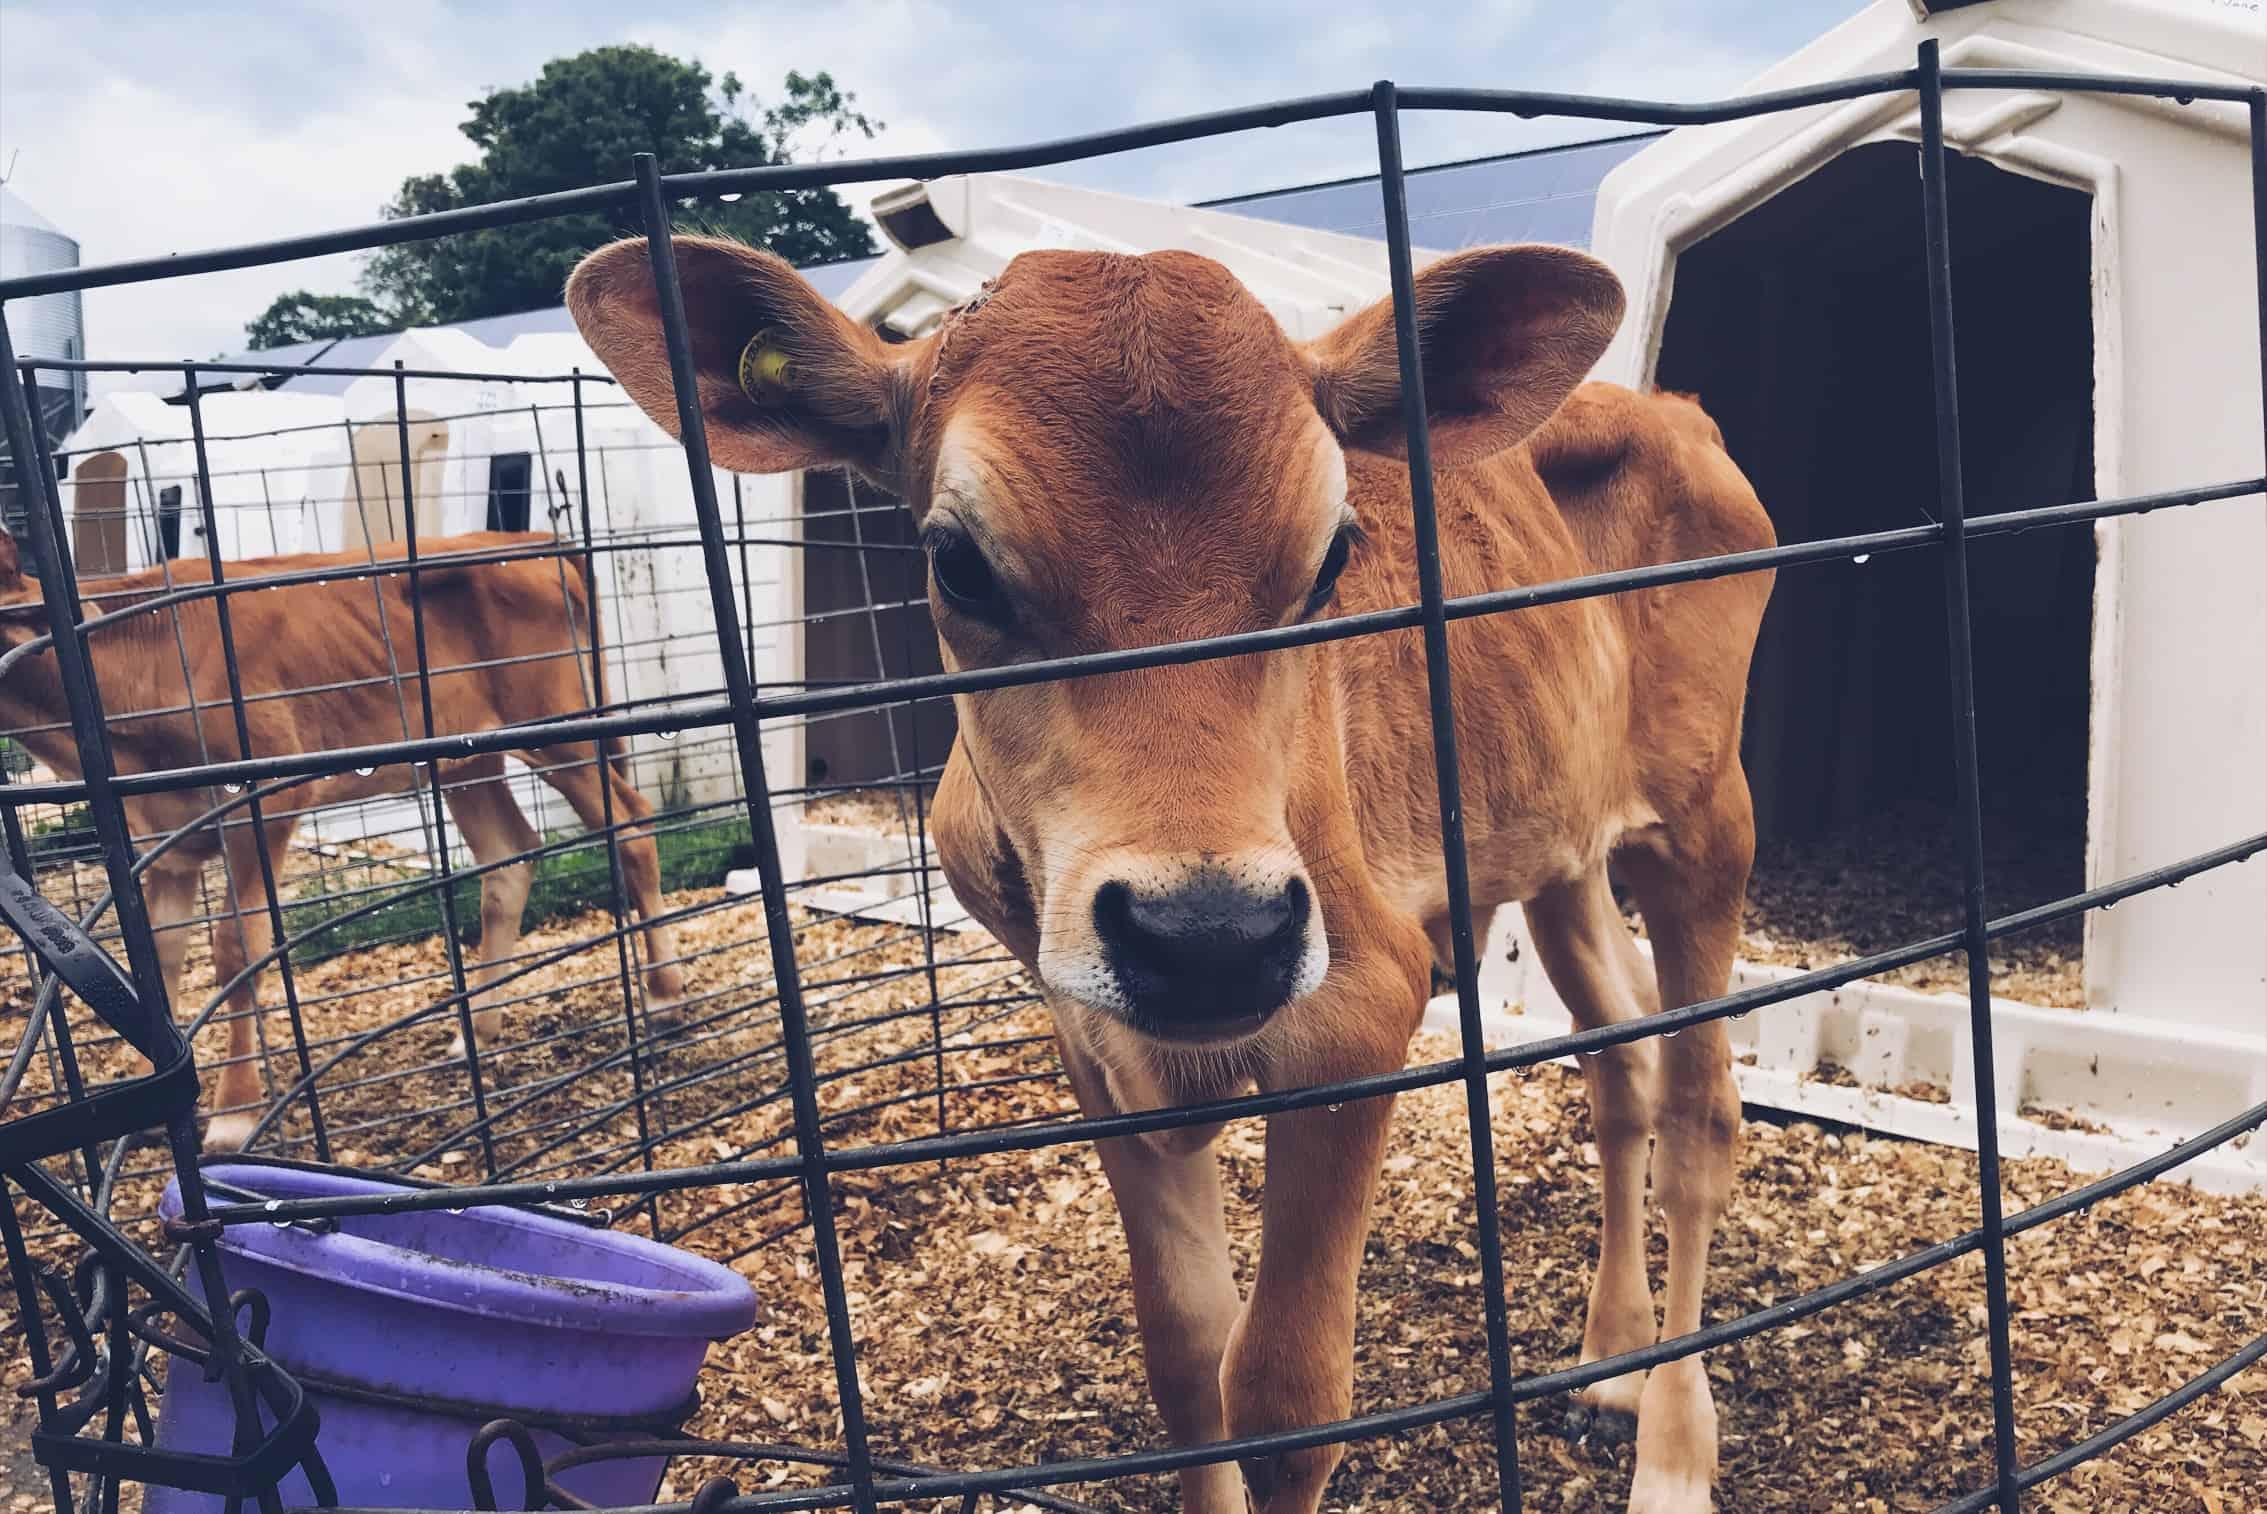 Calf at Richardson Farm in Woodstock, VT